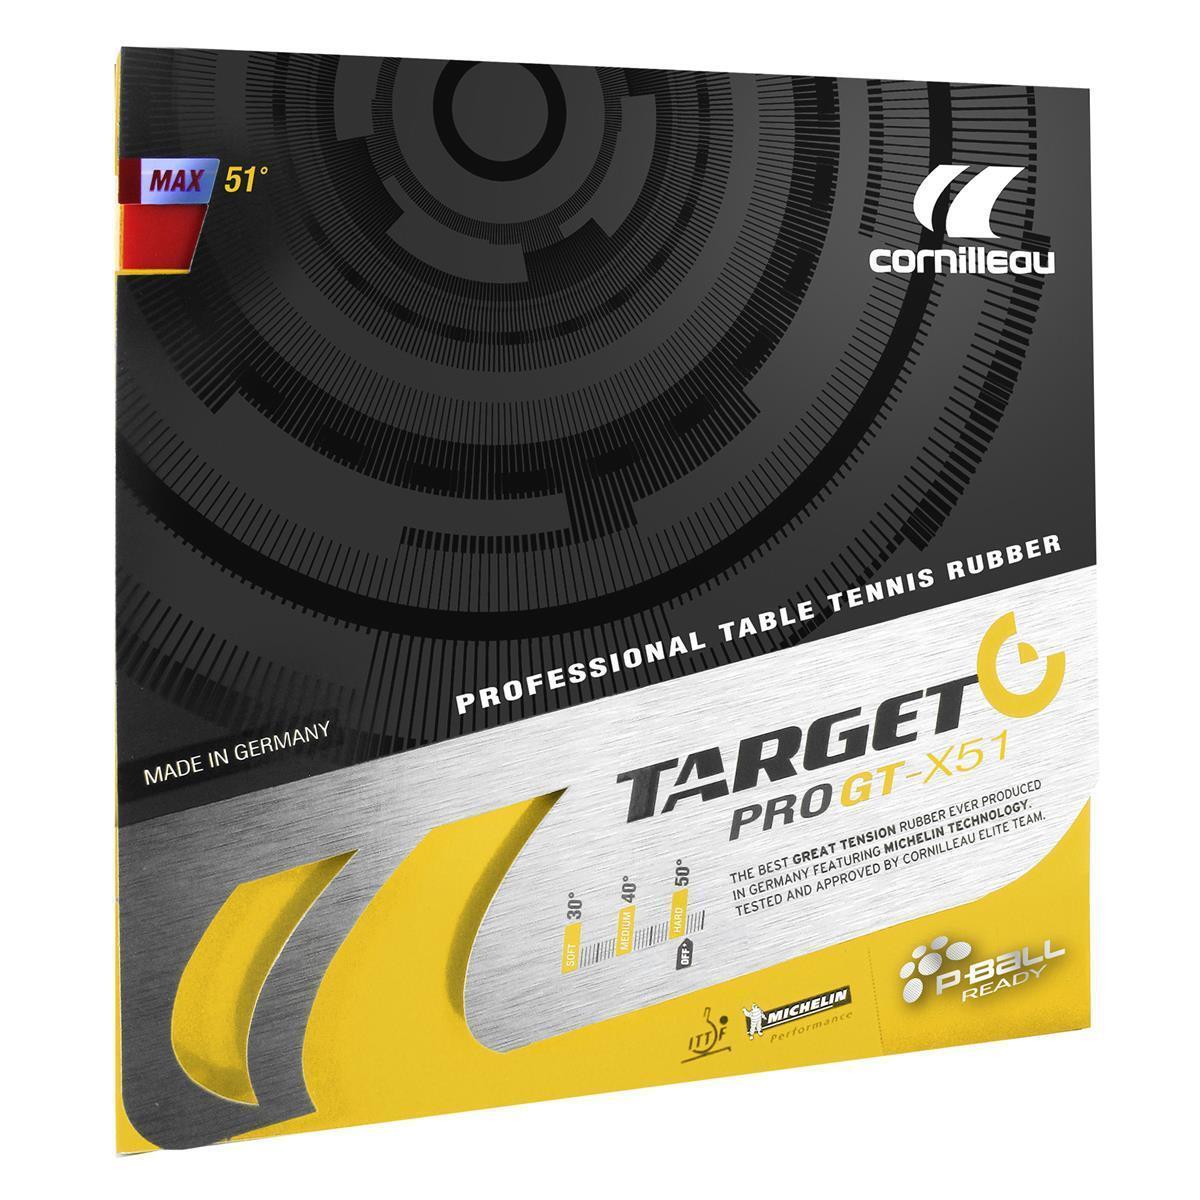 Cornilleau Target Pro GT-X51 Table Tennis Rubber